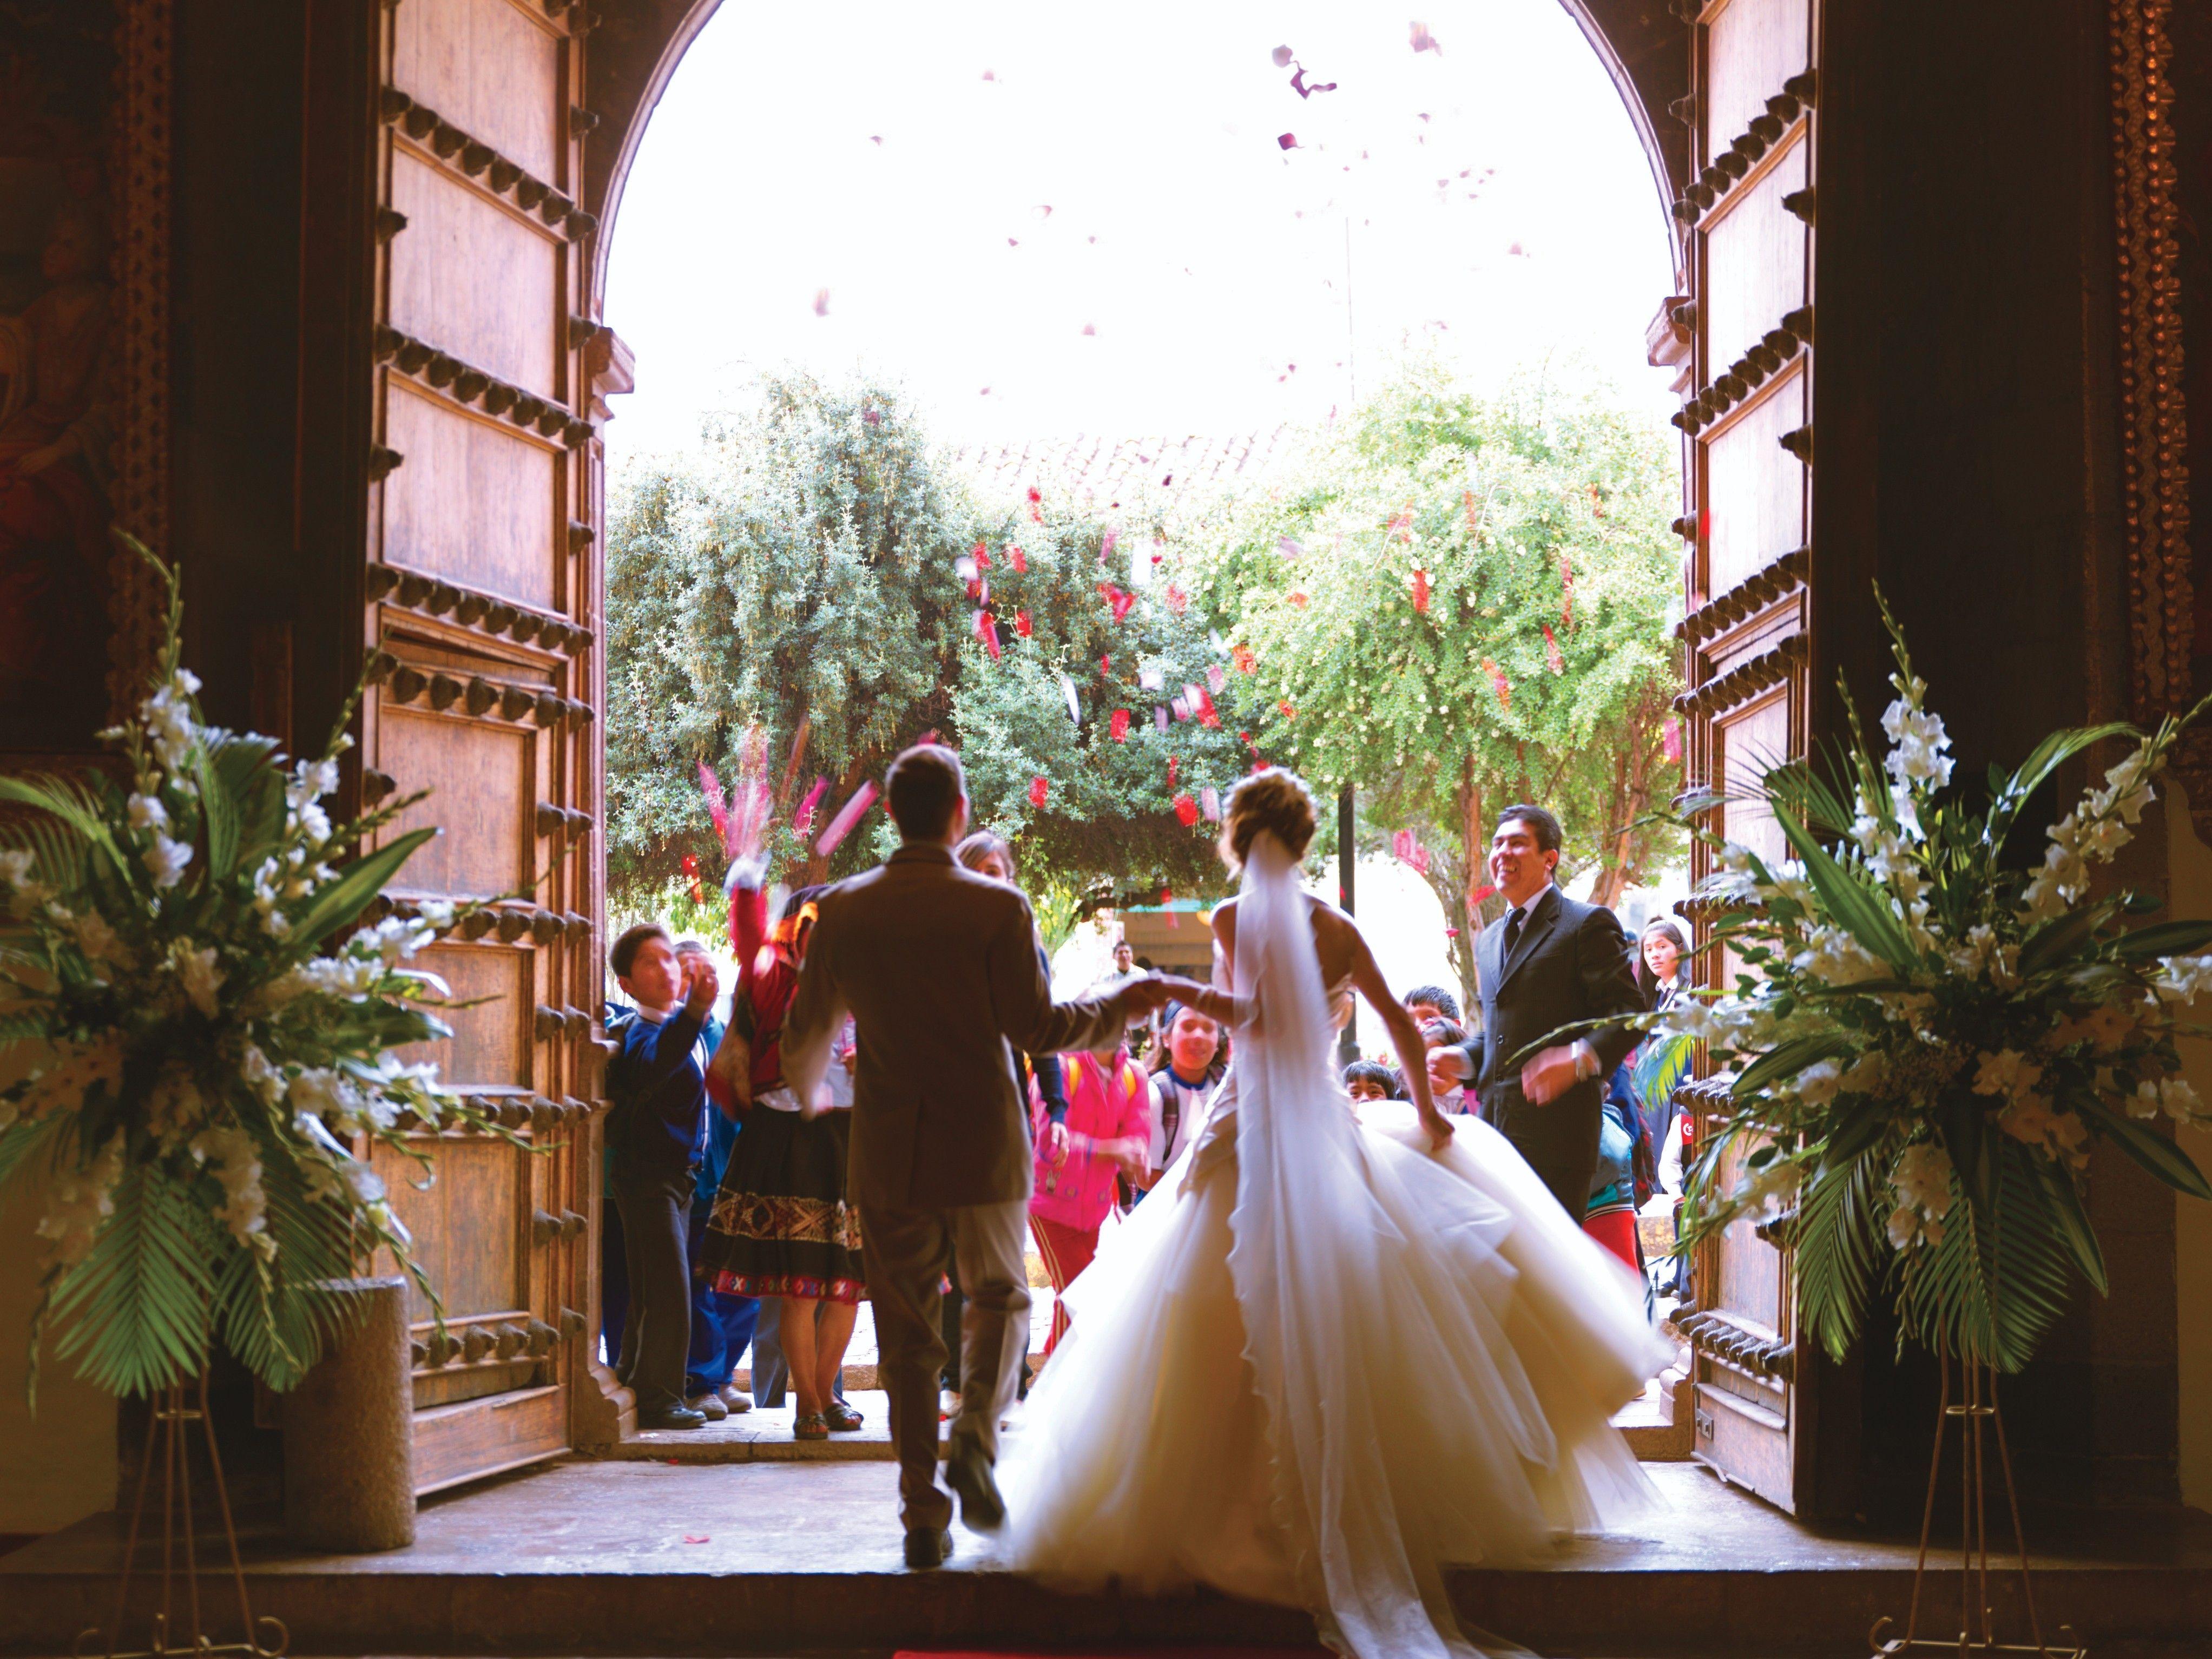 hotel monasterio cusco peru wedding bride just married